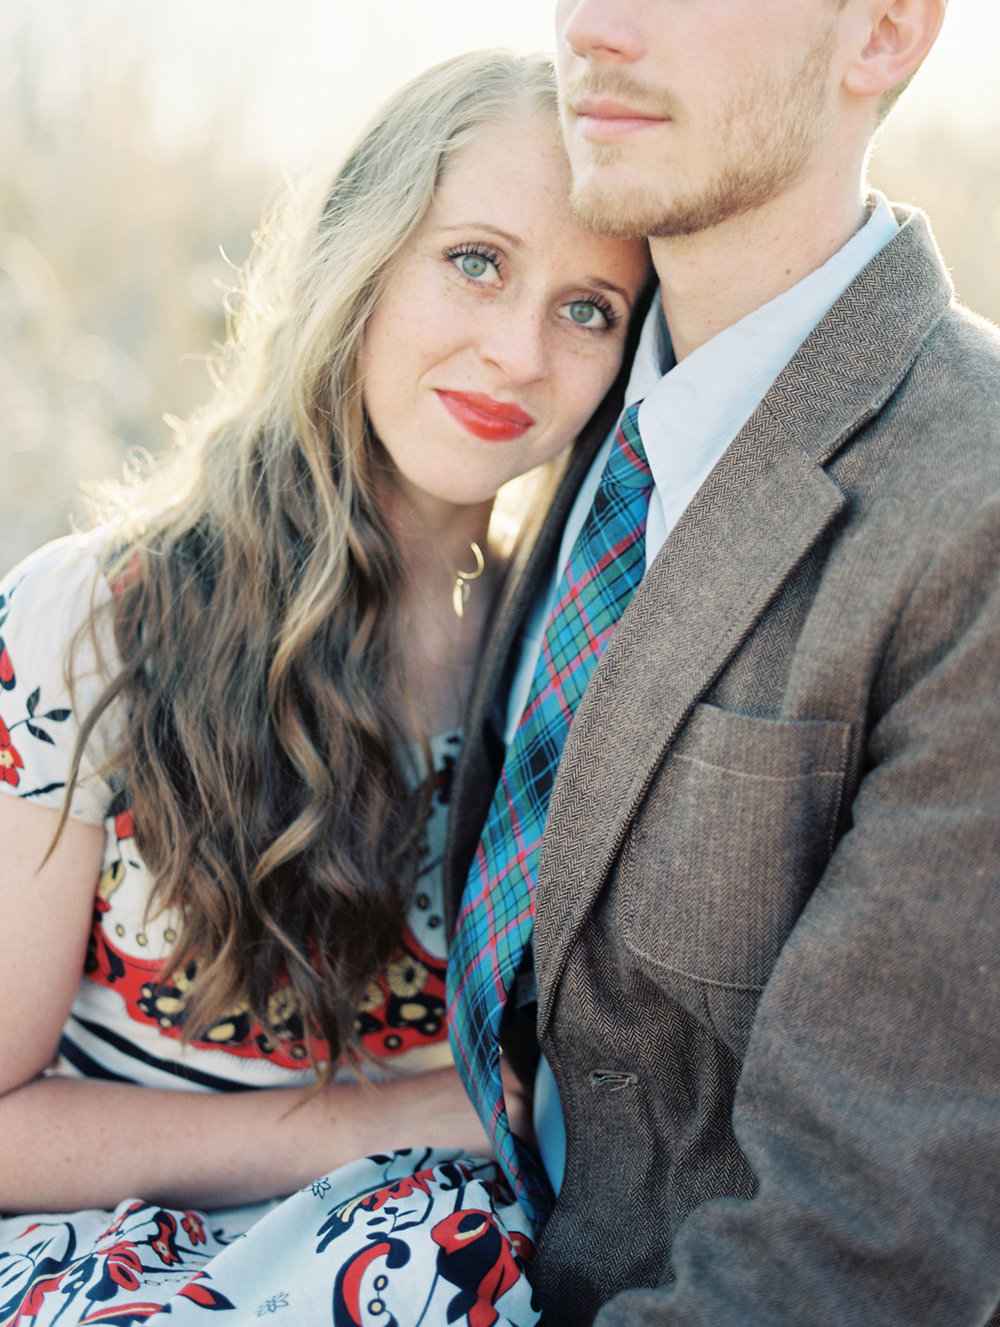 Jerica&Gabe20-2.jpg